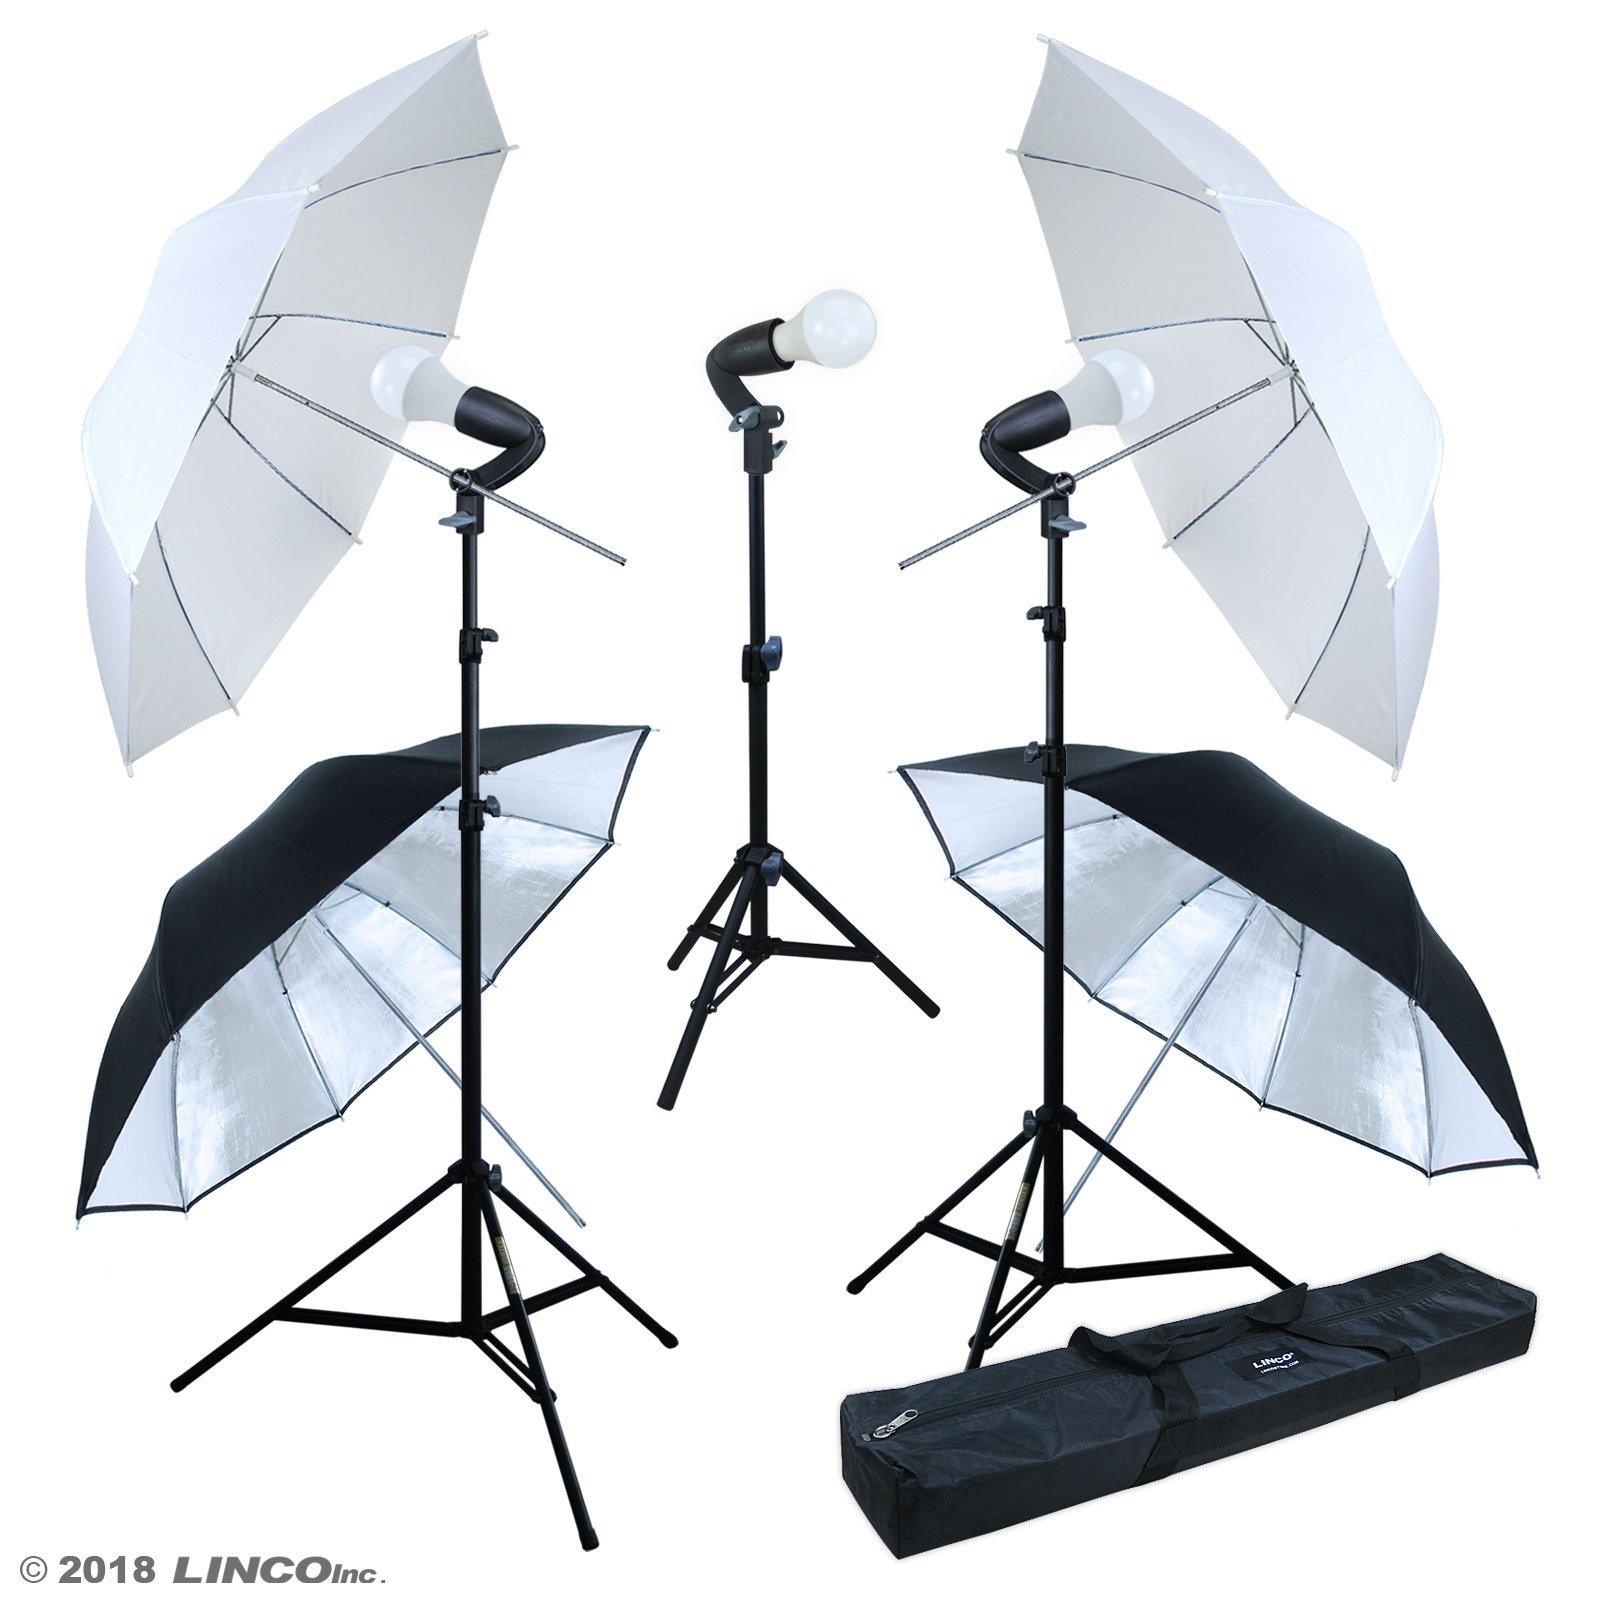 LINCO Lincostore Studio Lighting LED 2400 Lumens Umbrella Light Kit AM249 by Linco